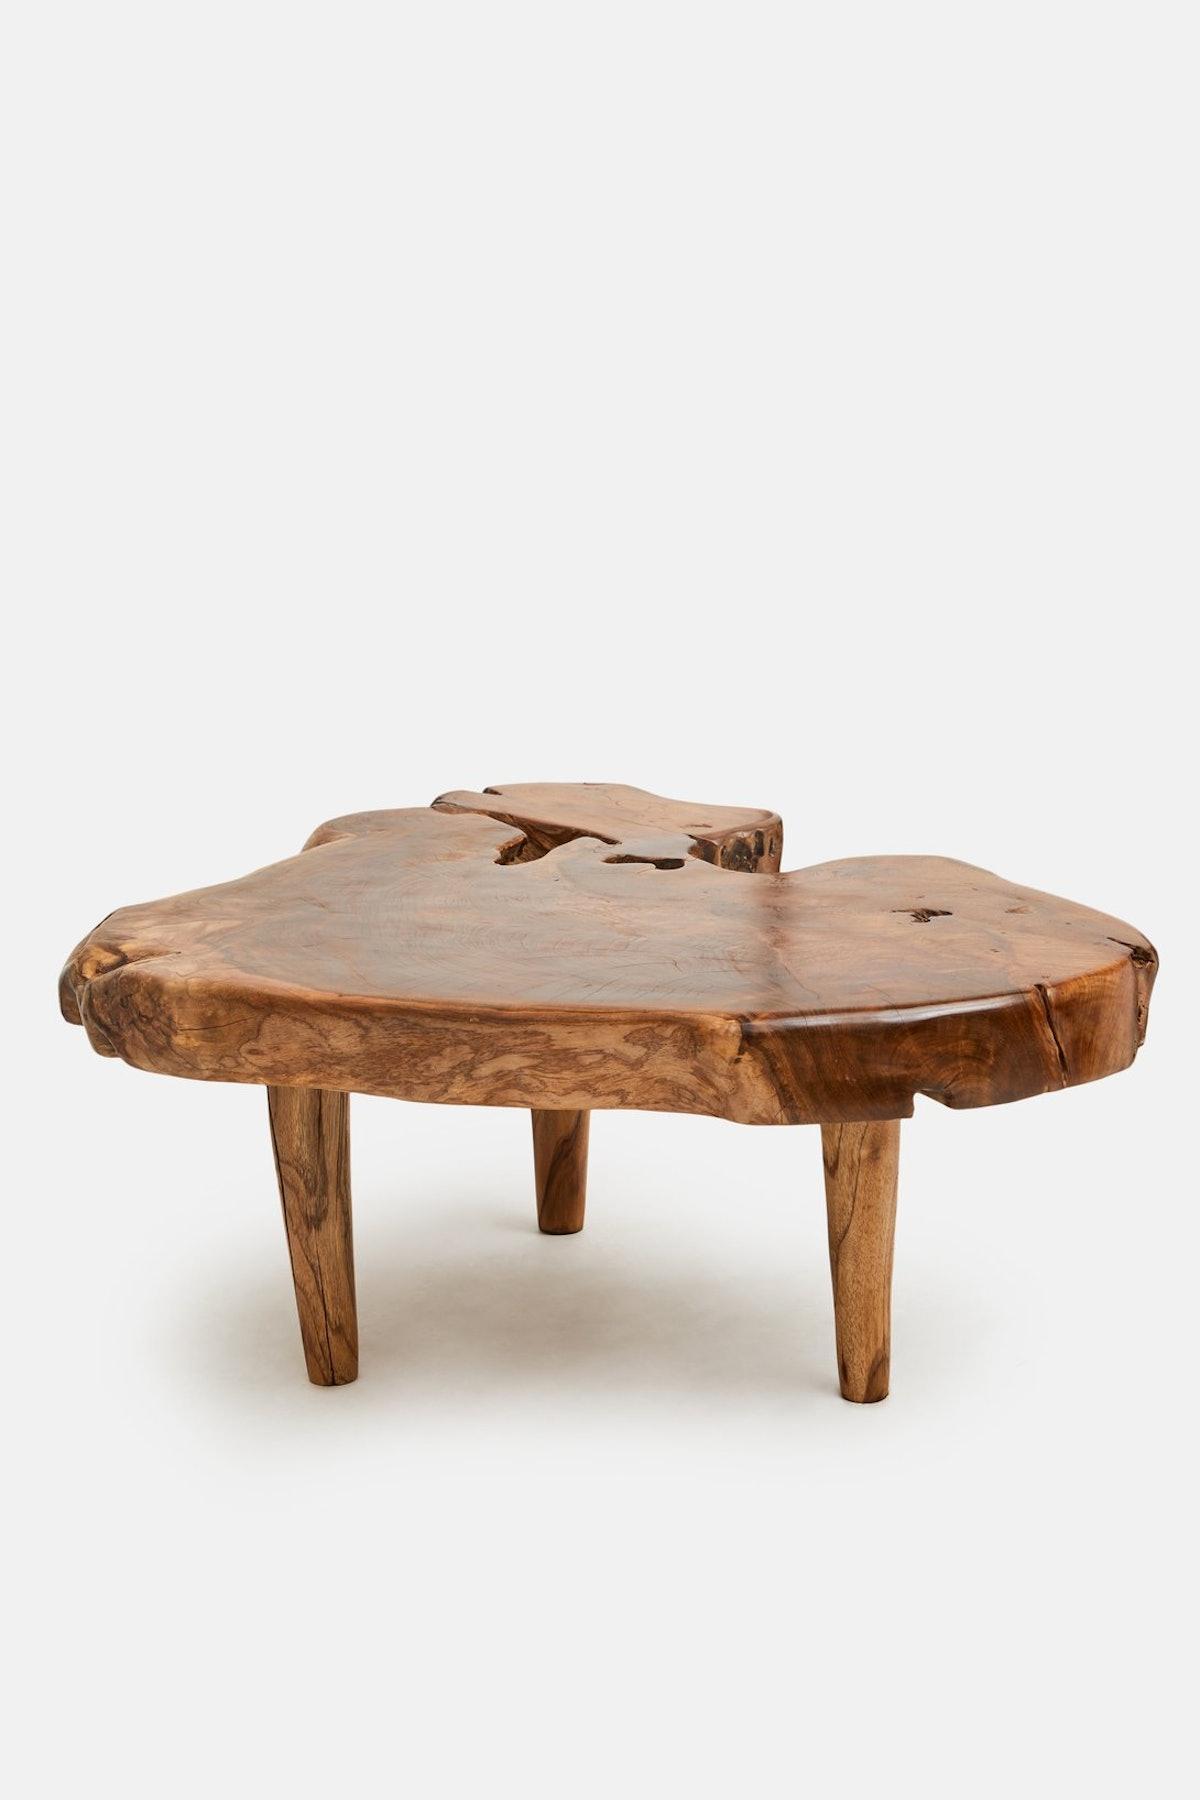 Andrianna Shamaris Organic Style Teak Coffee Table or Side Table